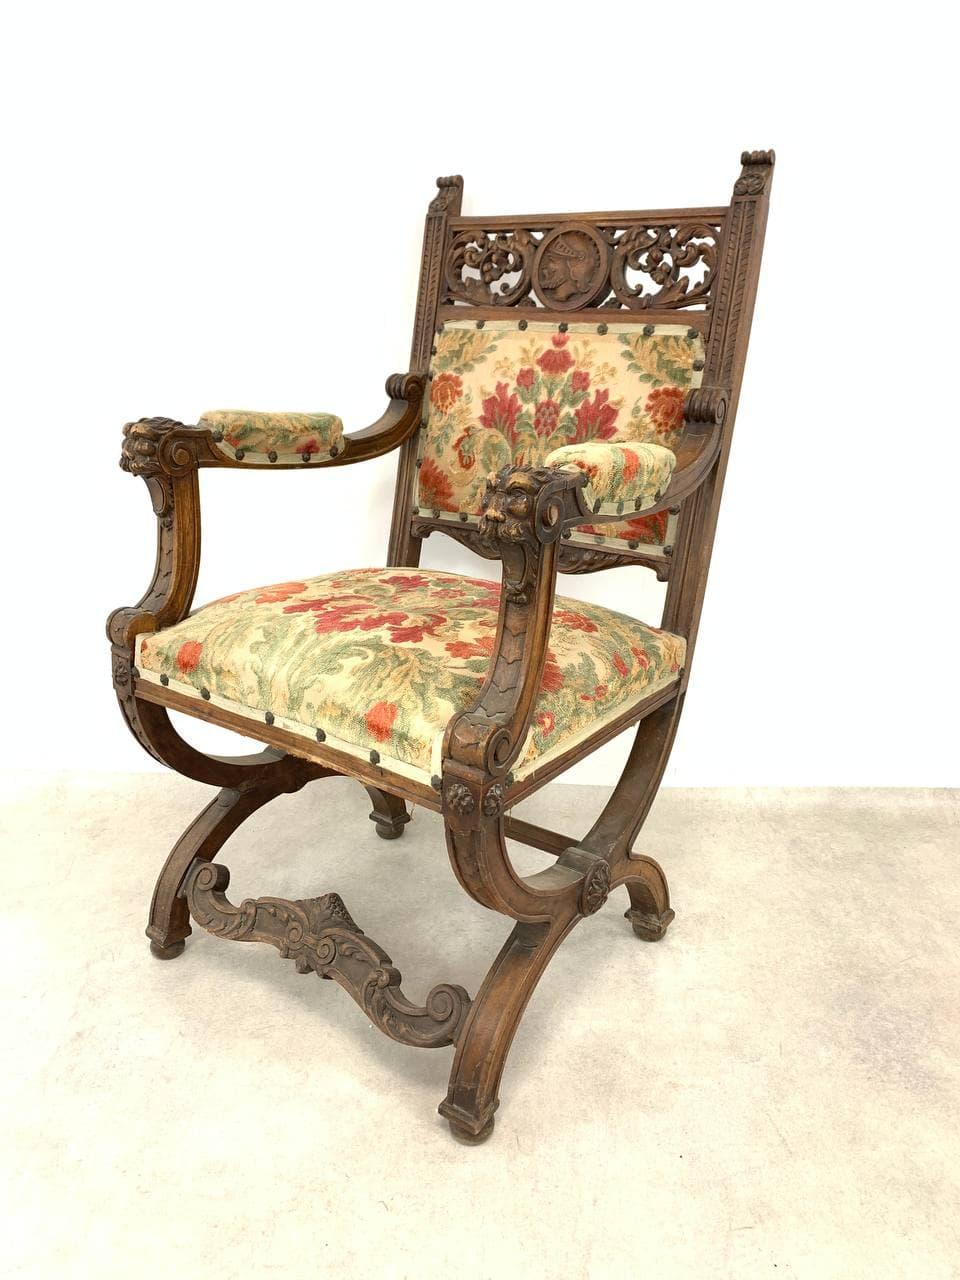 Антикварное кресло стиле Нео-Ренессанс